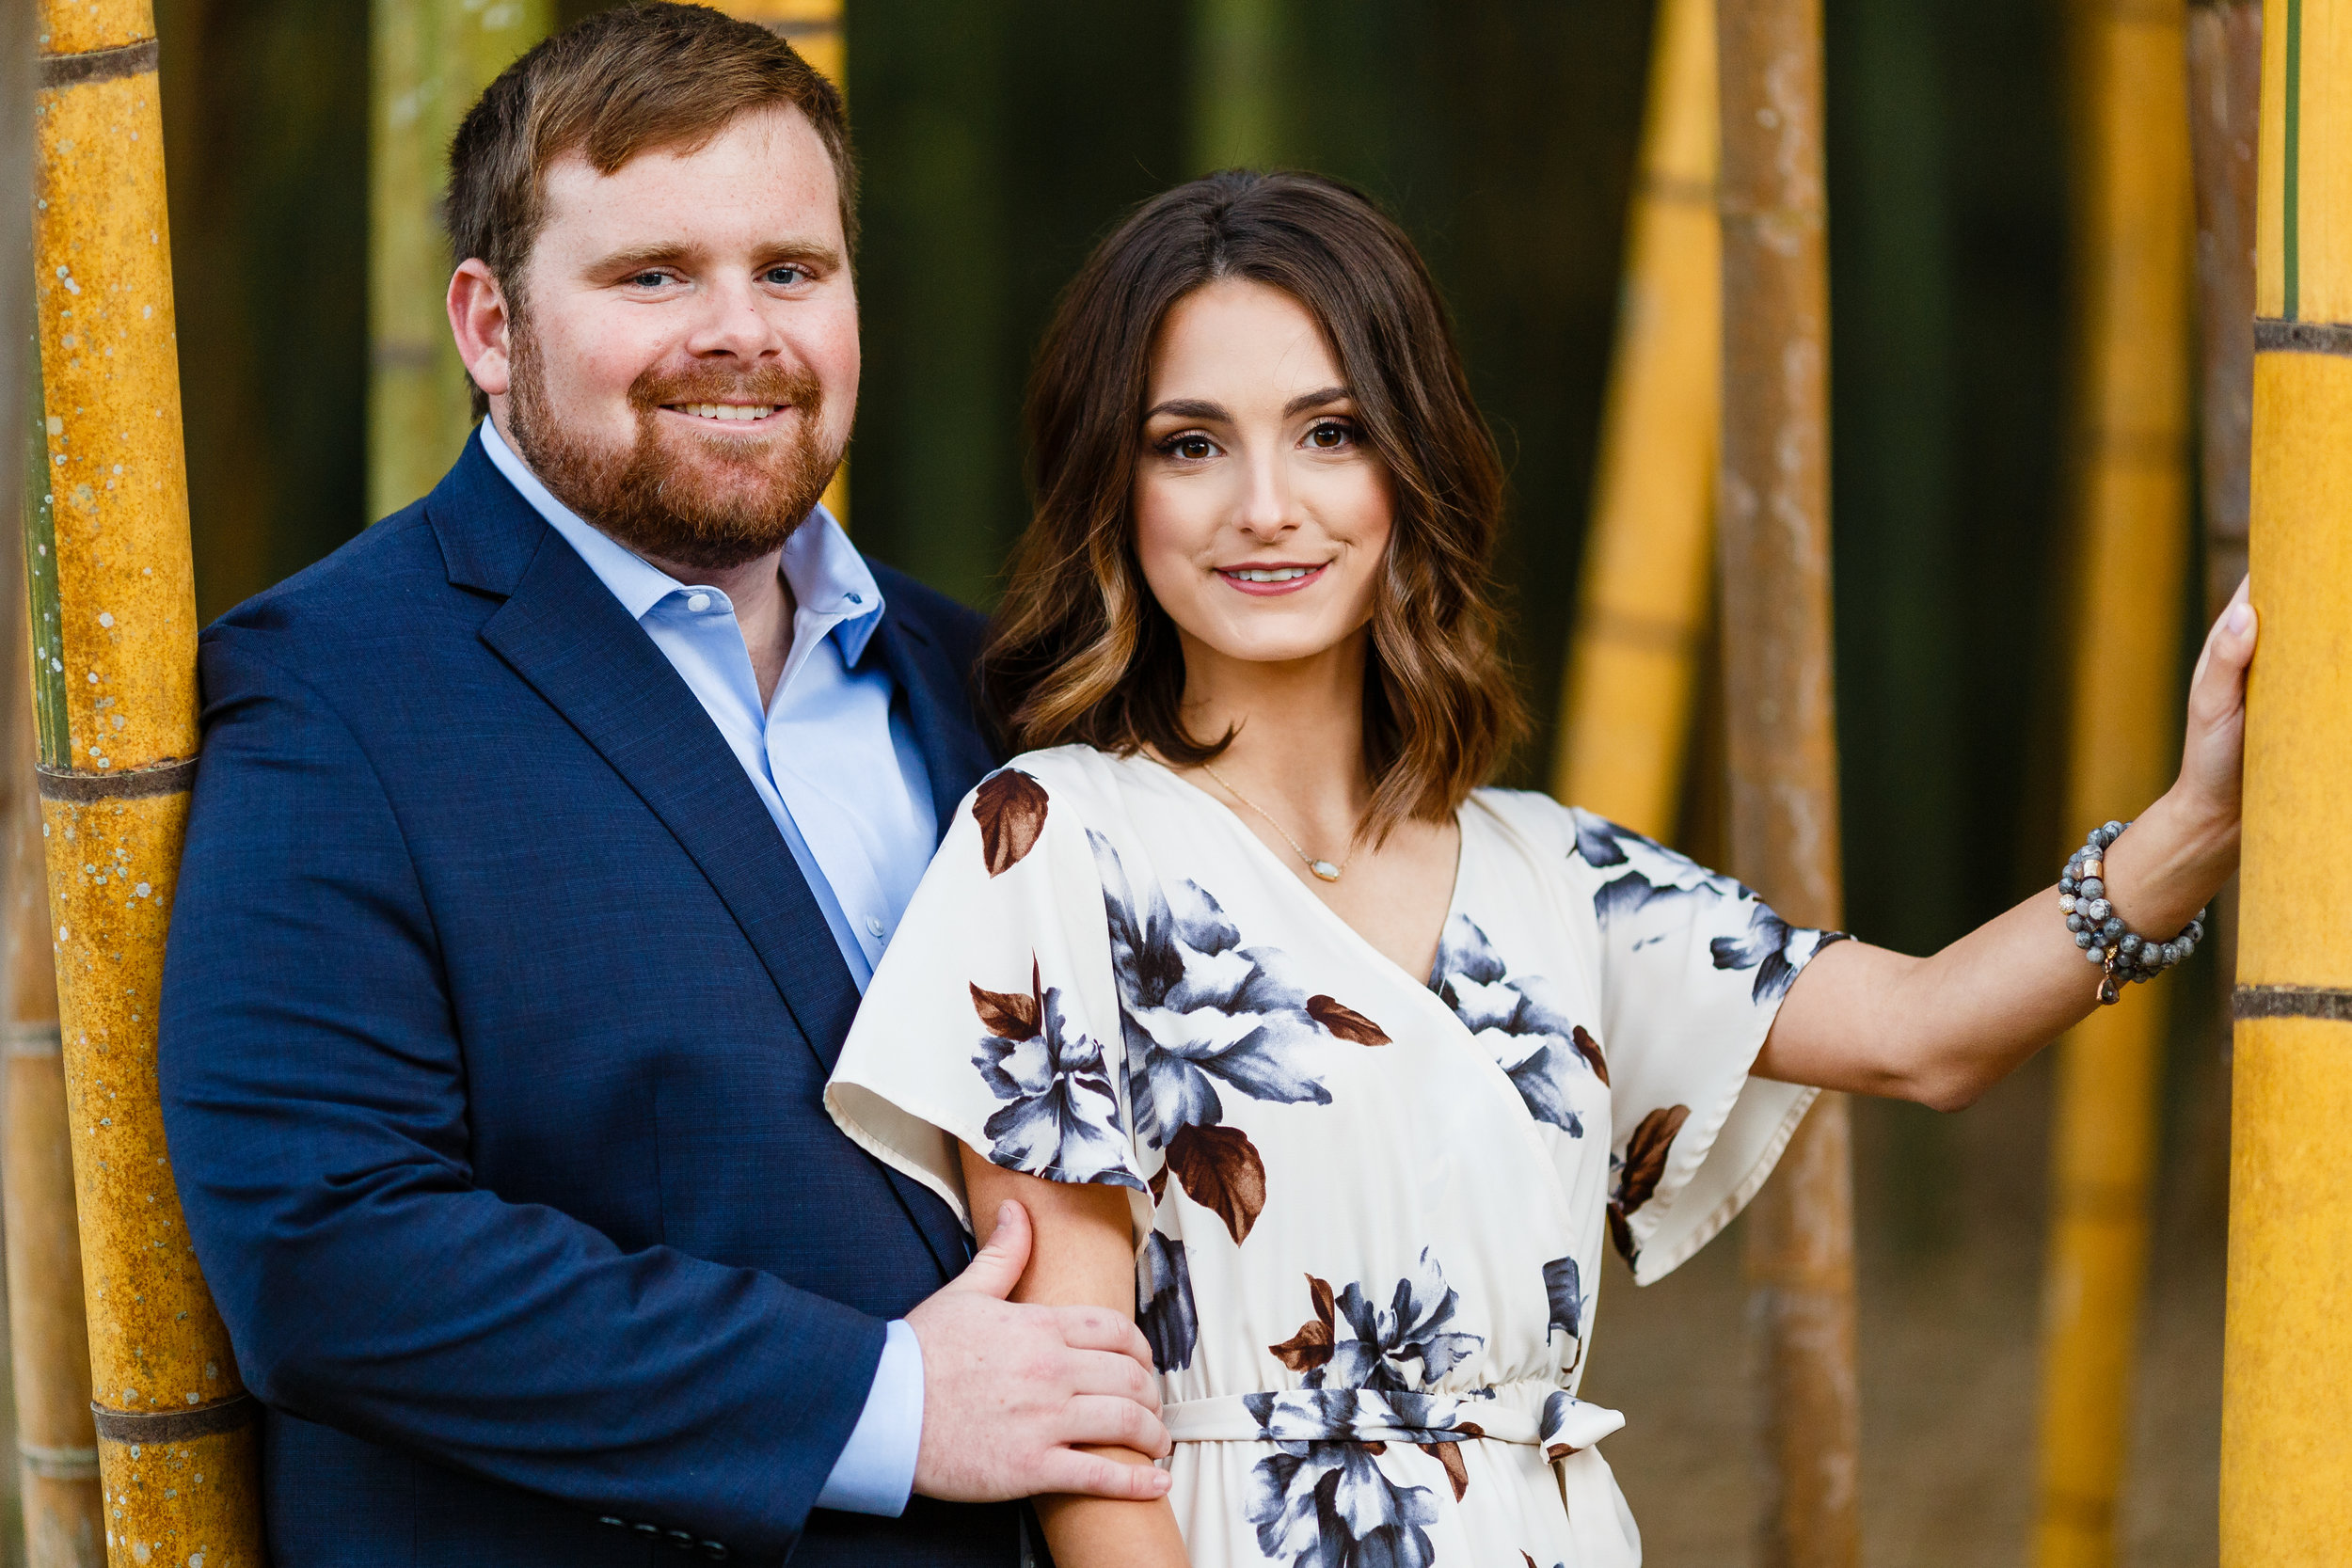 Youngsville-lafayette-portrait-family-wedding-photographer-9224.jpg